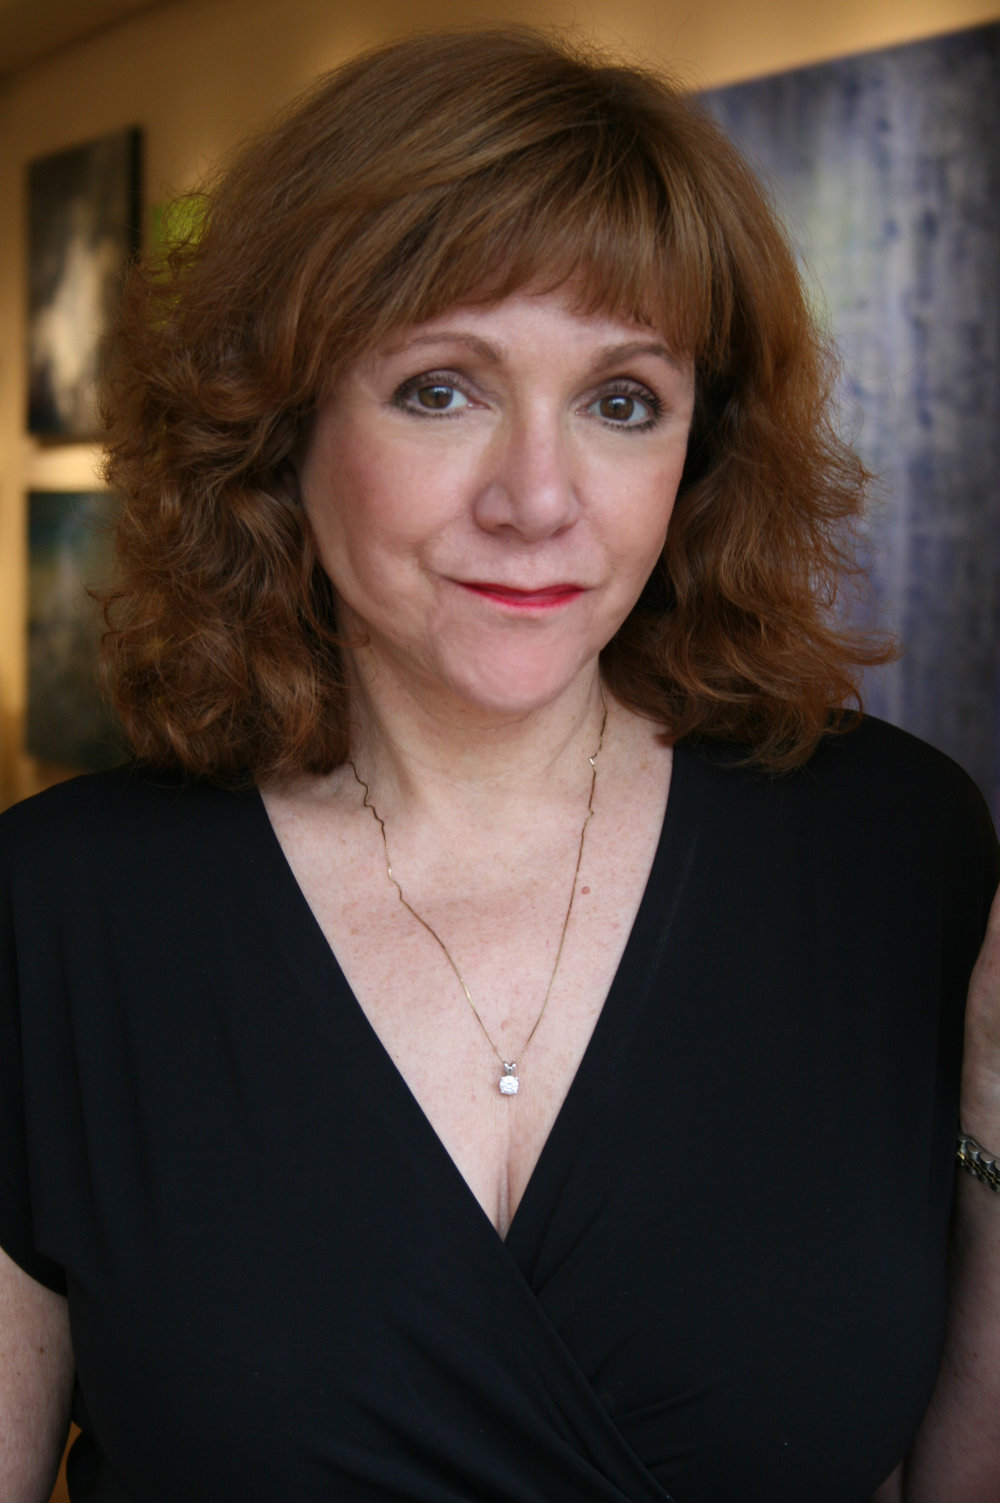 Gallery owner Sandra Pelletier at Sorelle Gallery, New Canaan.